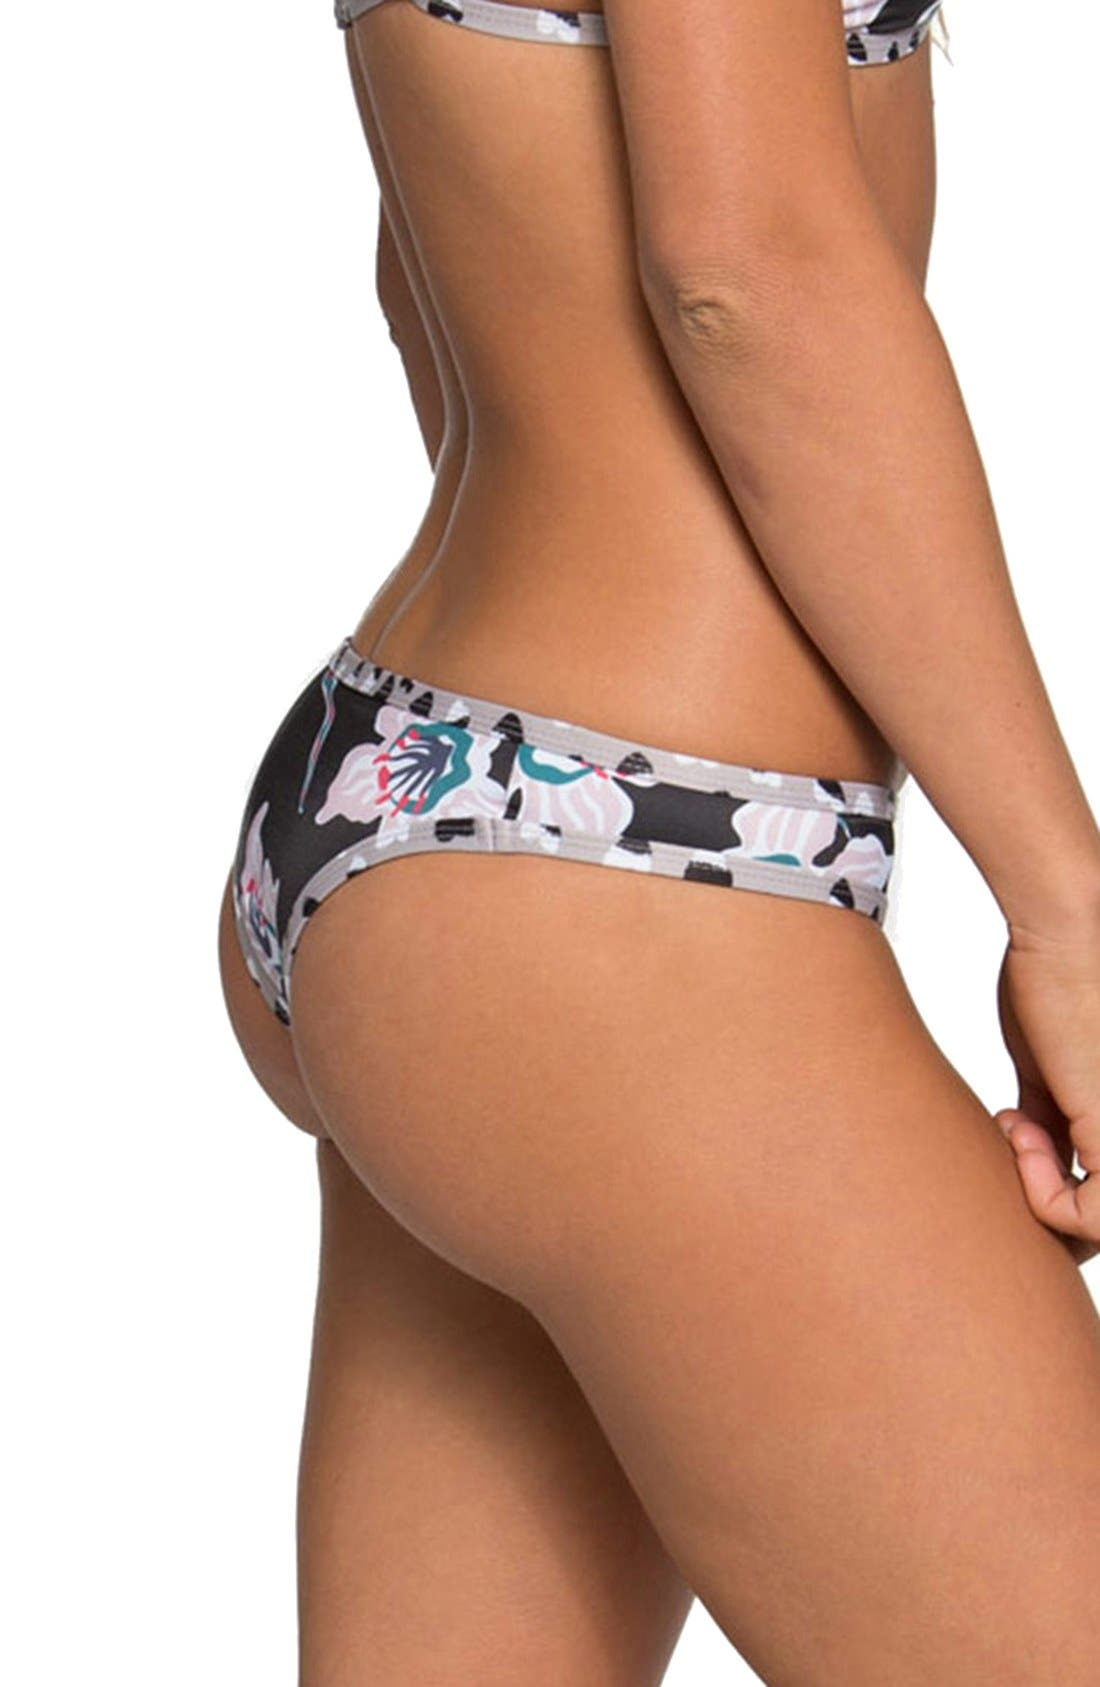 'Jayden' Minimal Coverage Bikini Bottoms,                             Alternate thumbnail 2, color,                             005